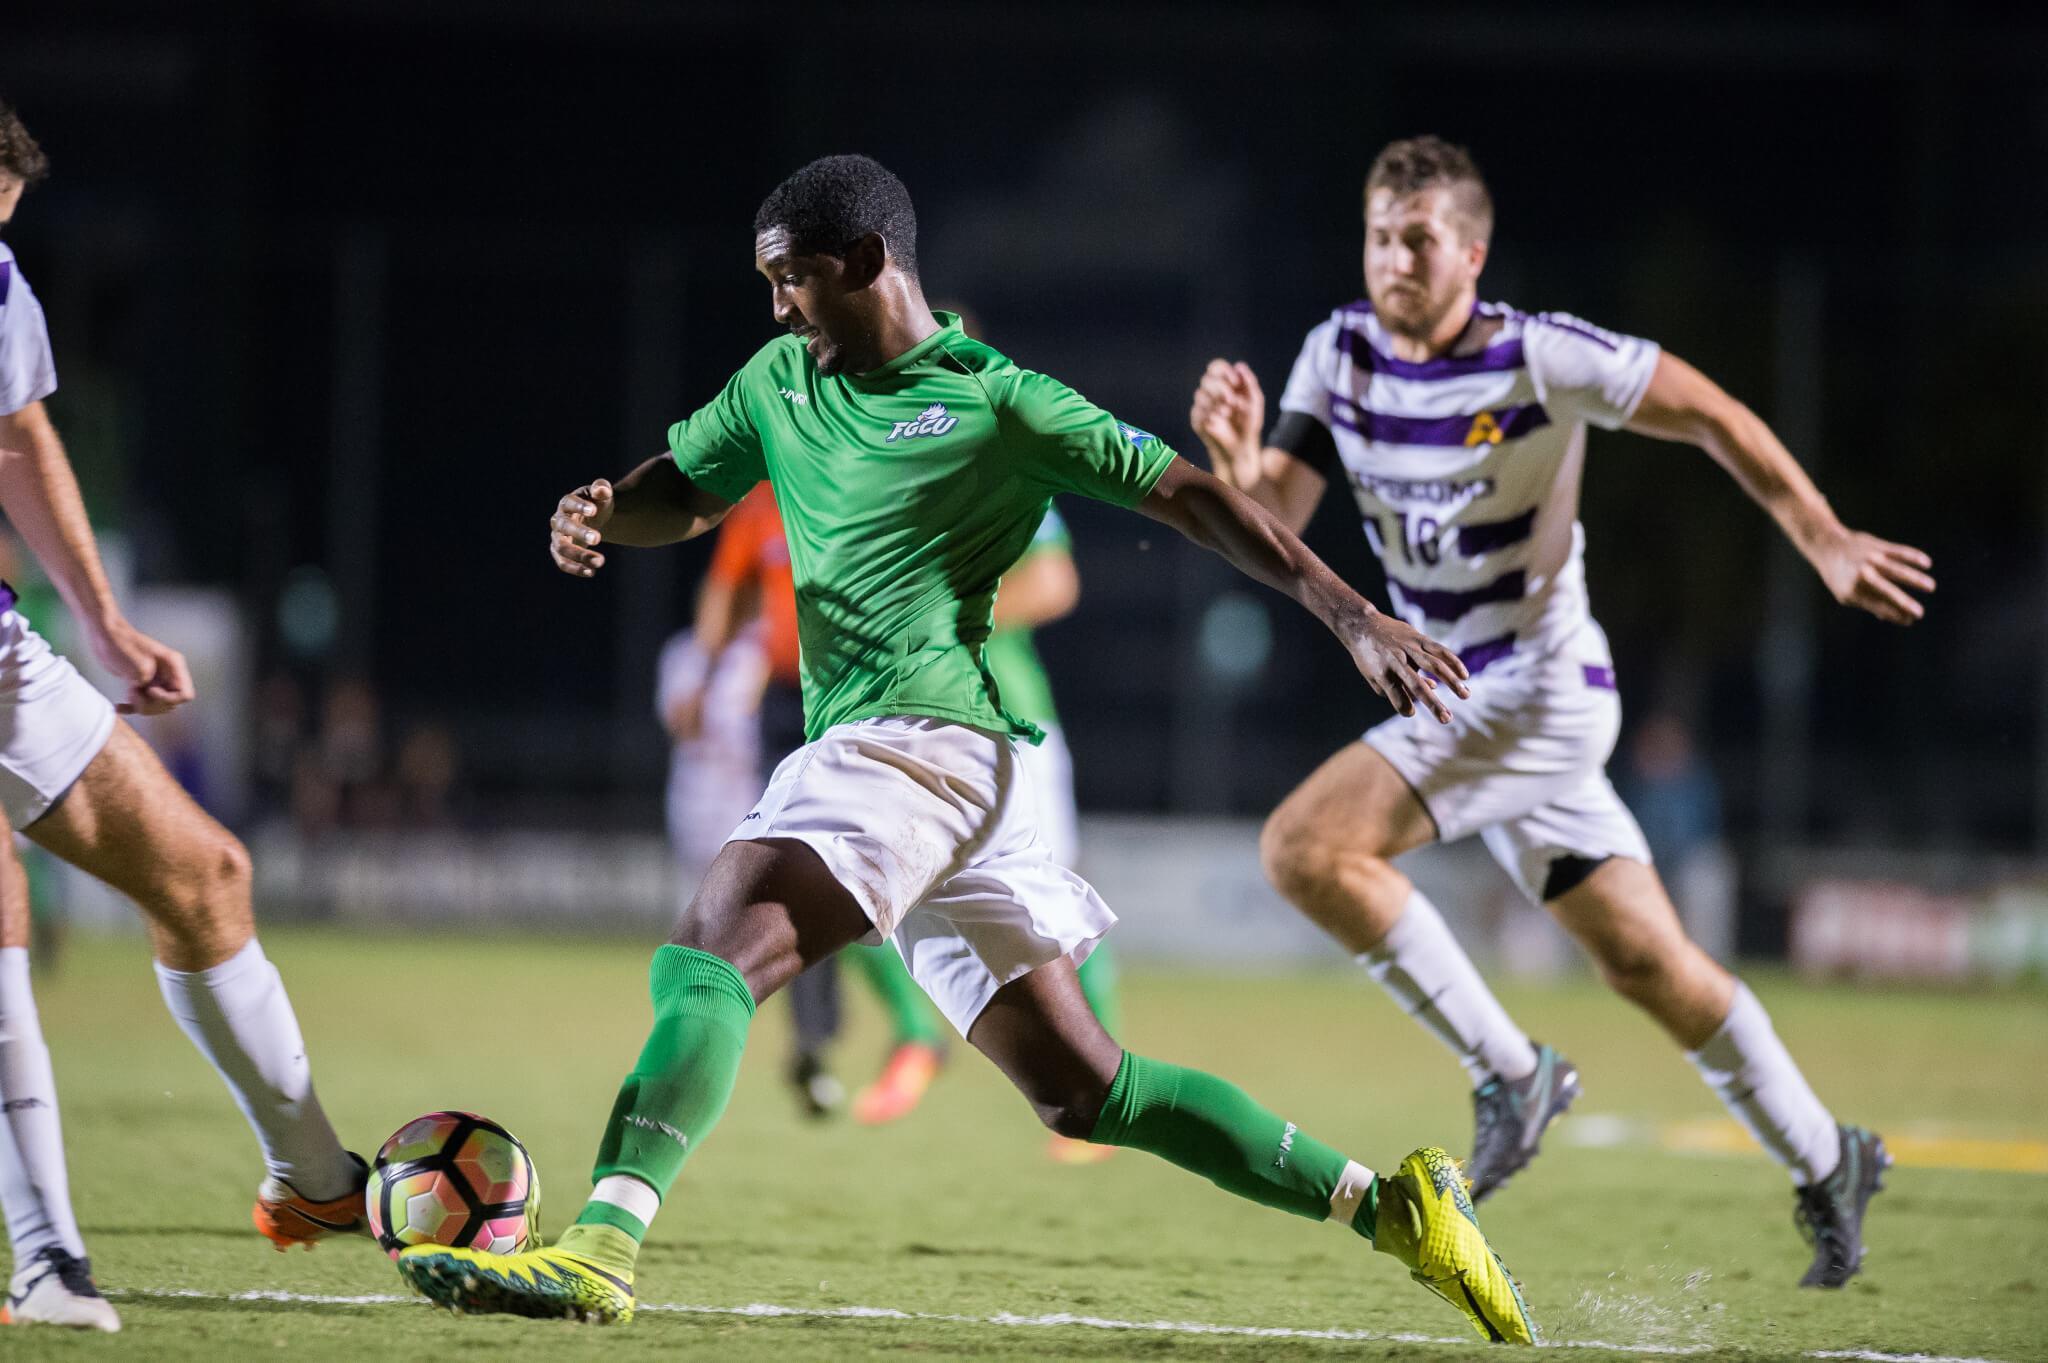 No. 20 FGCU men's soccer advances to ASUN Men's Soccer Championship Final